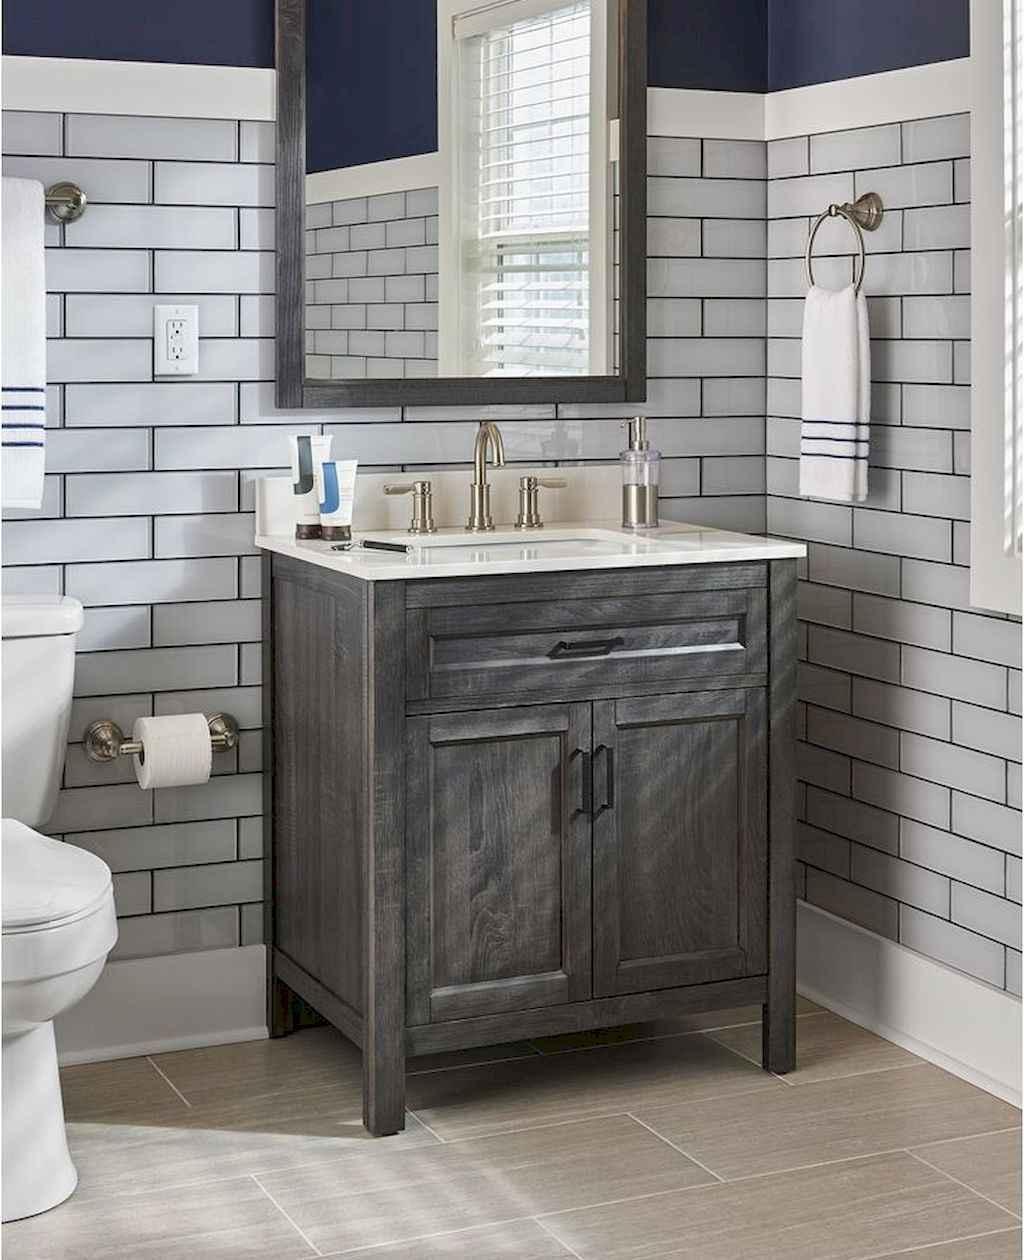 125 awesome farmhouse bathroom vanity remodel ideas (117)